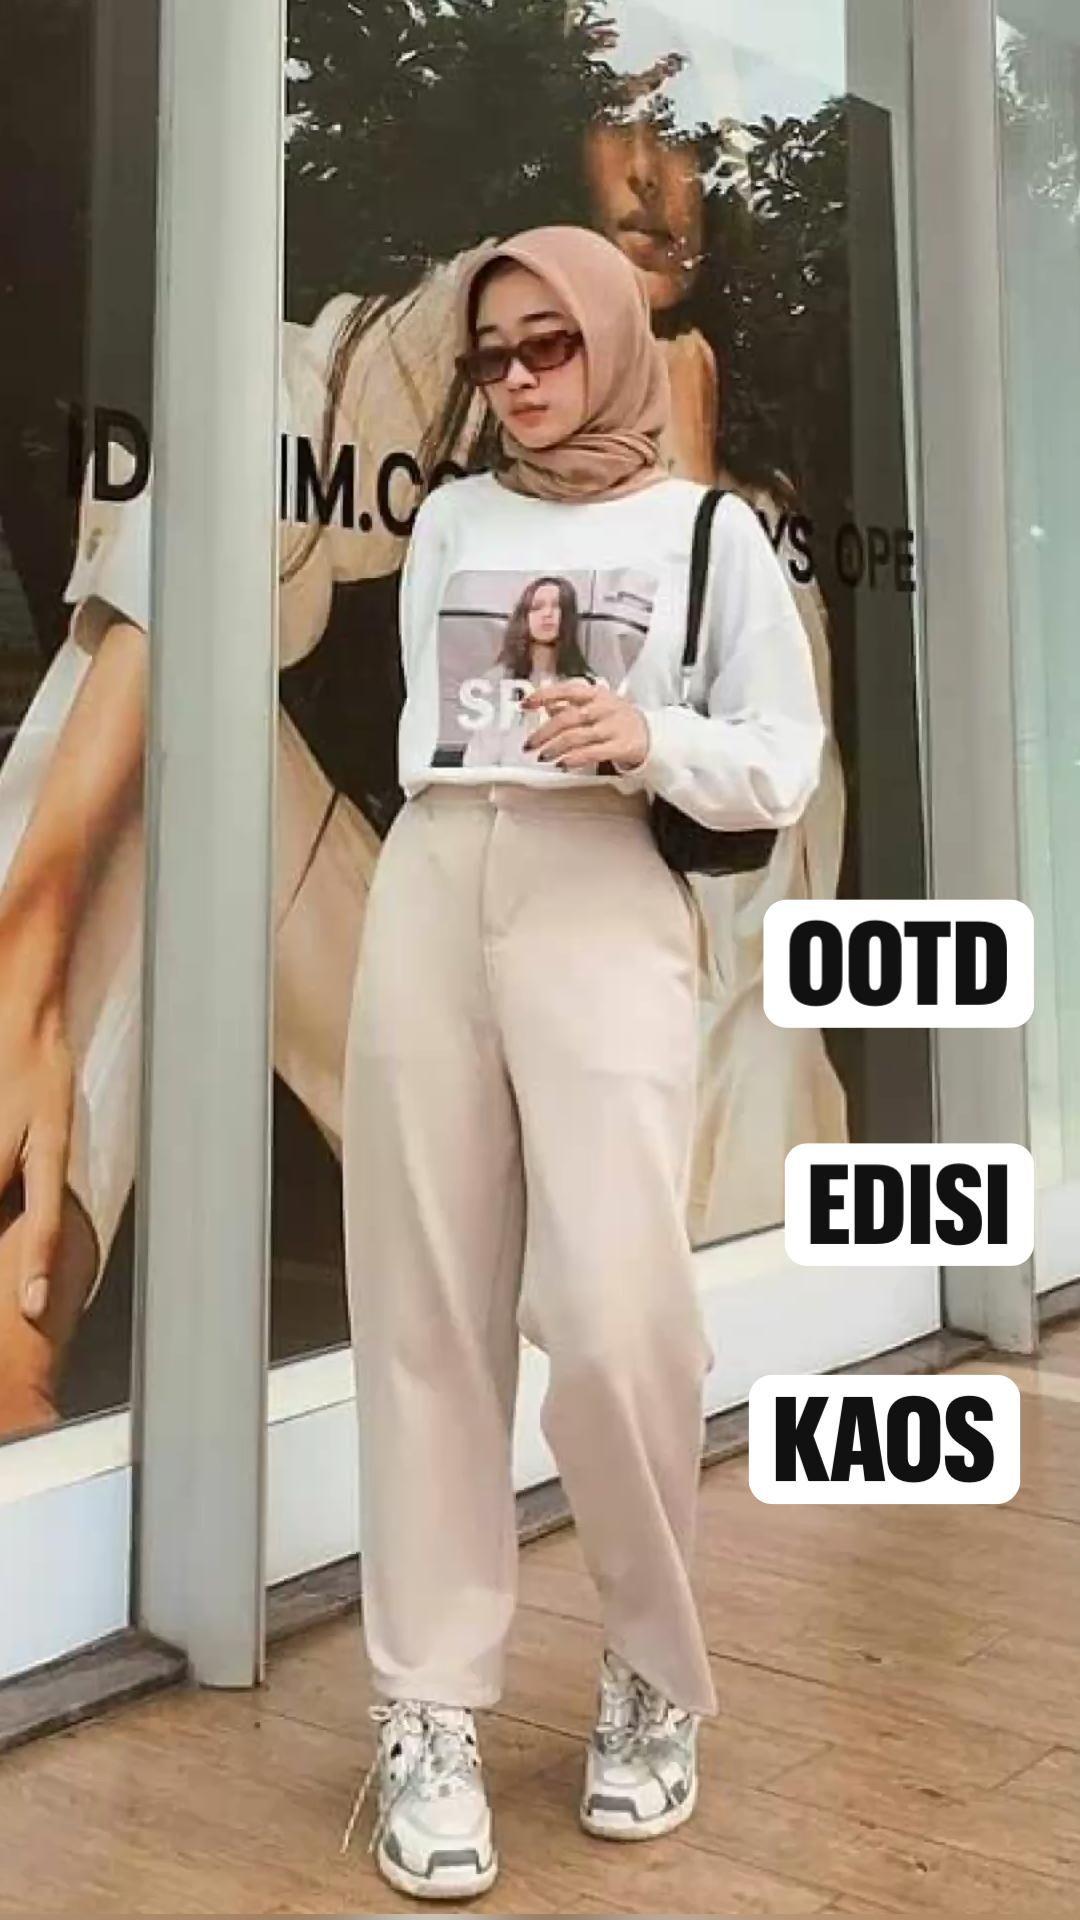 Ootd kaos hijab